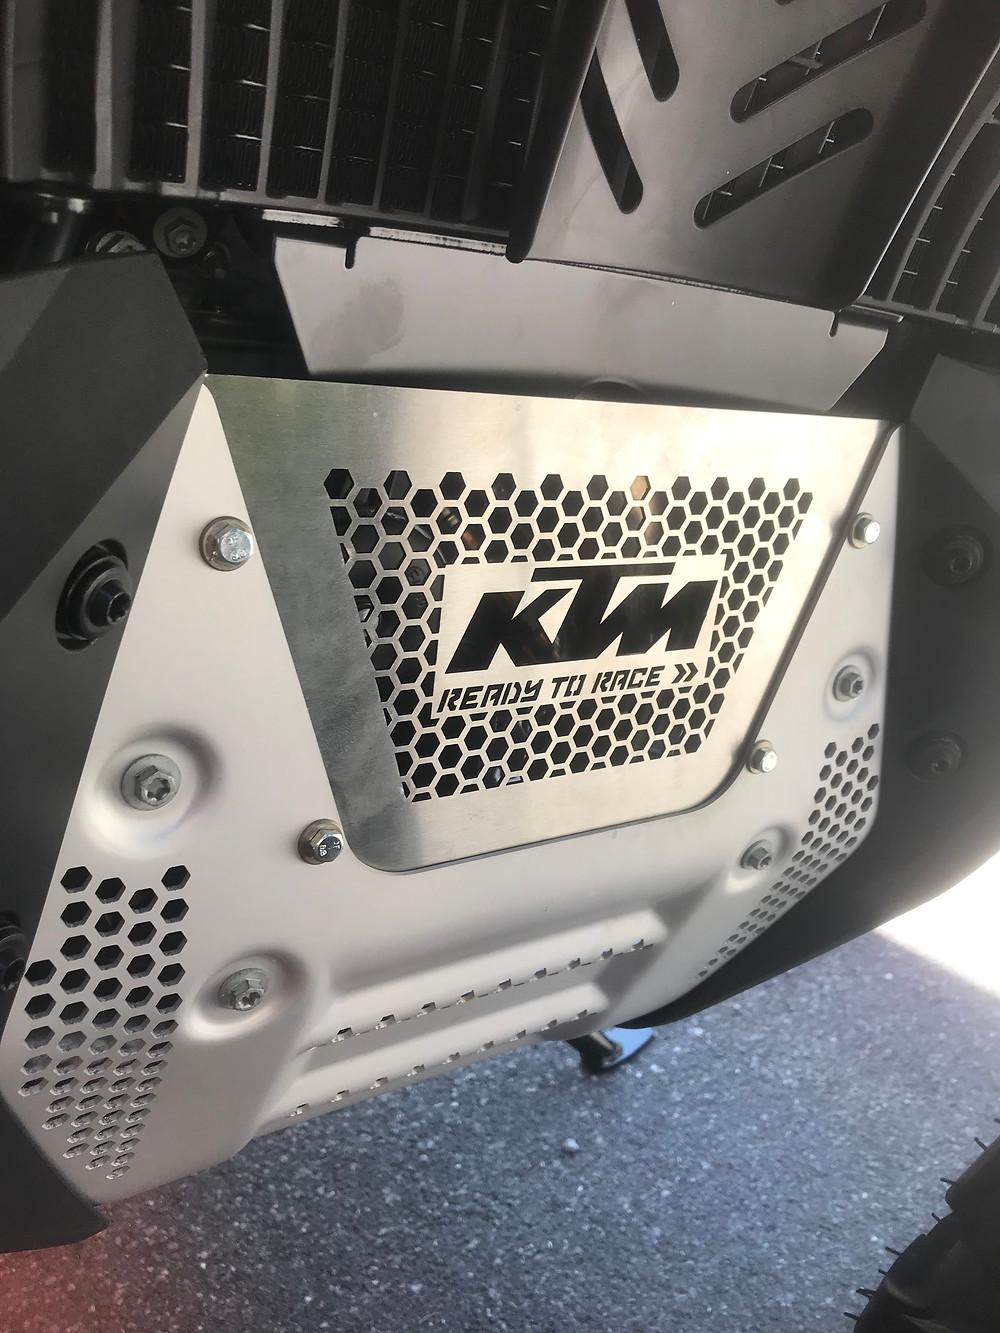 KTM 790 Adventure Crap Flap Joel Moreira Vit Garage Portugal